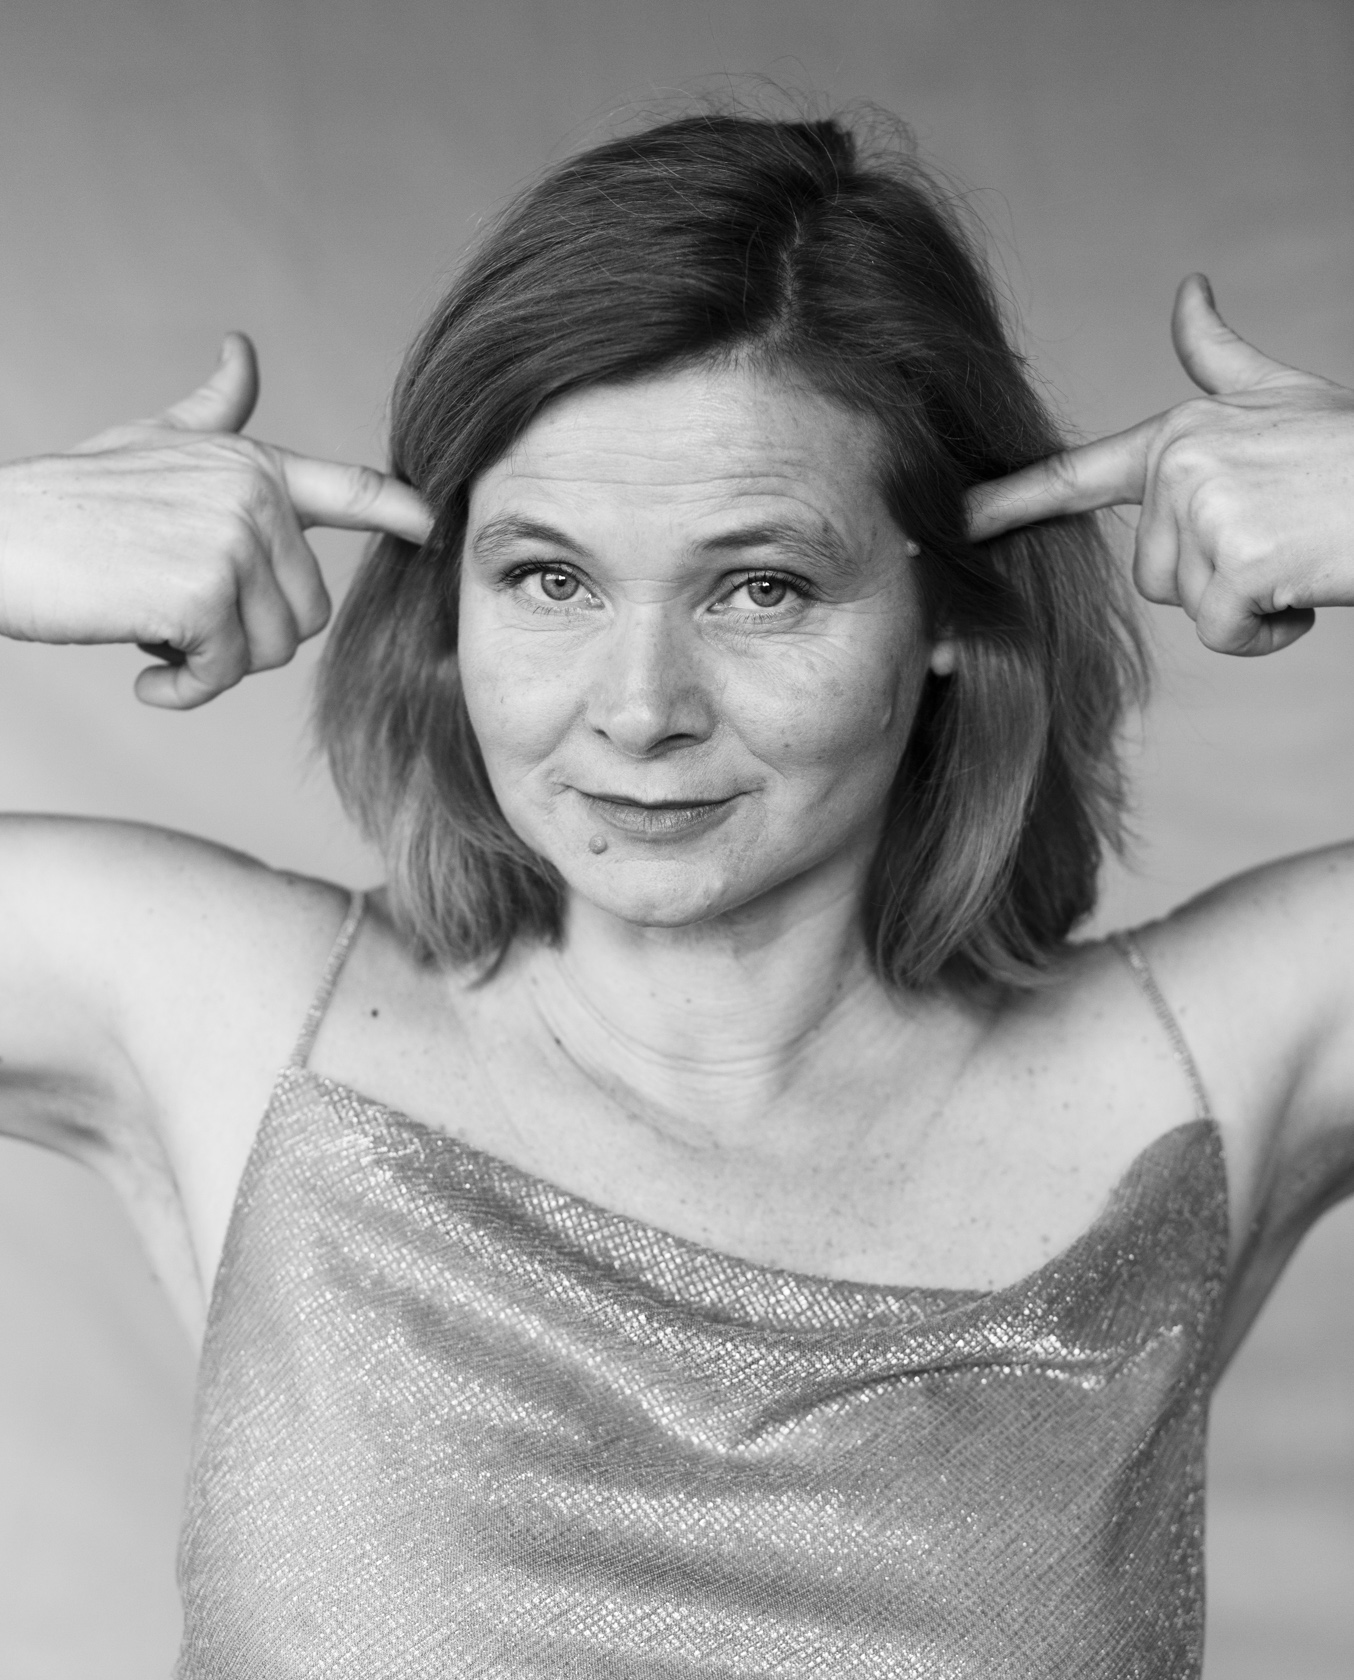 Bernadette La Hengst - Wir sind die Vielen 1